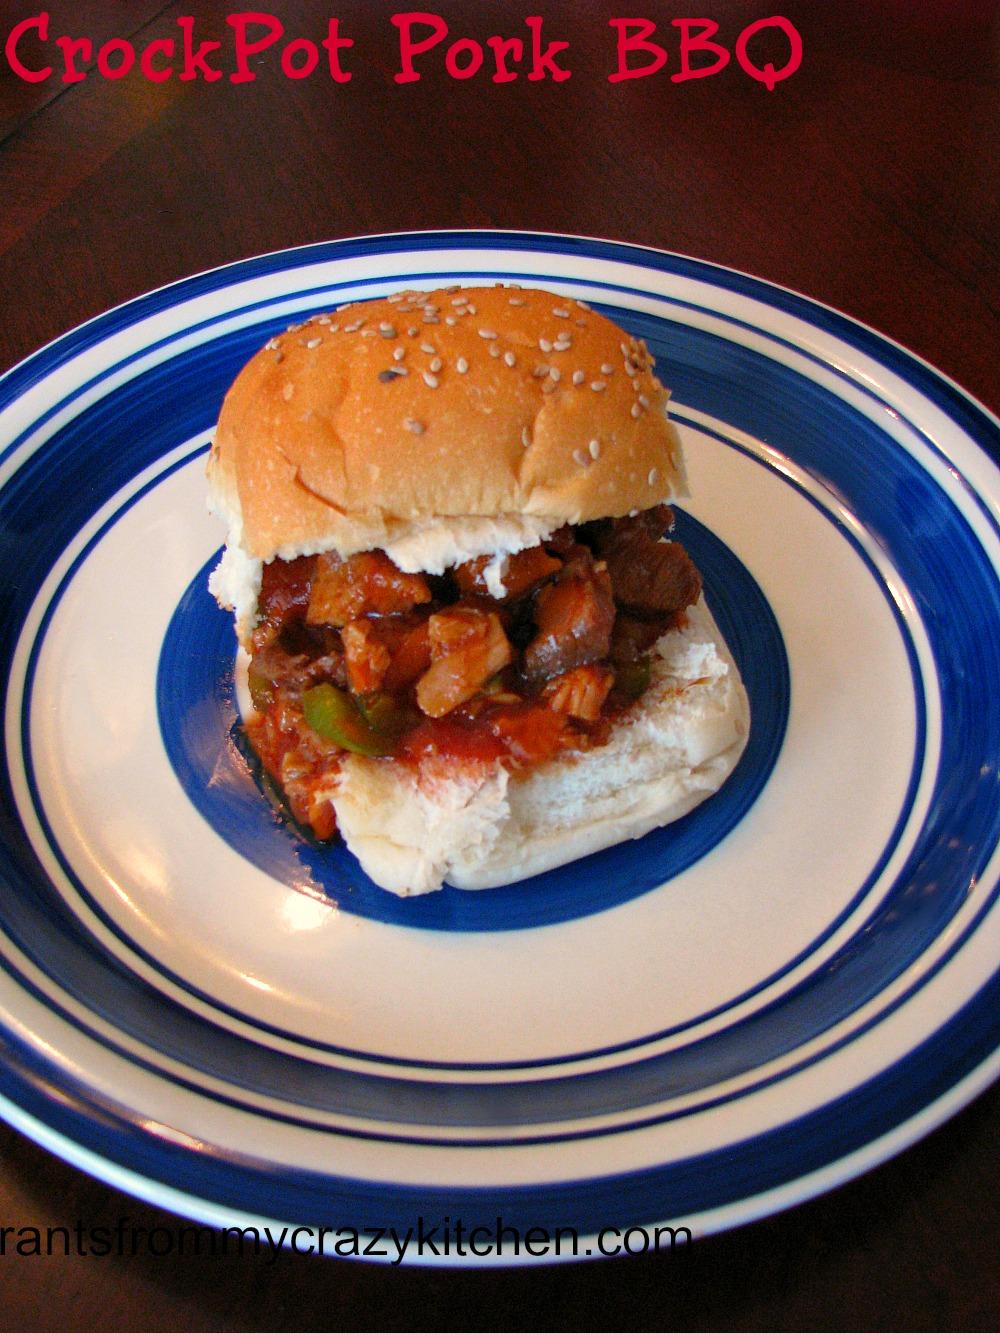 CrockPot Pork BBQ